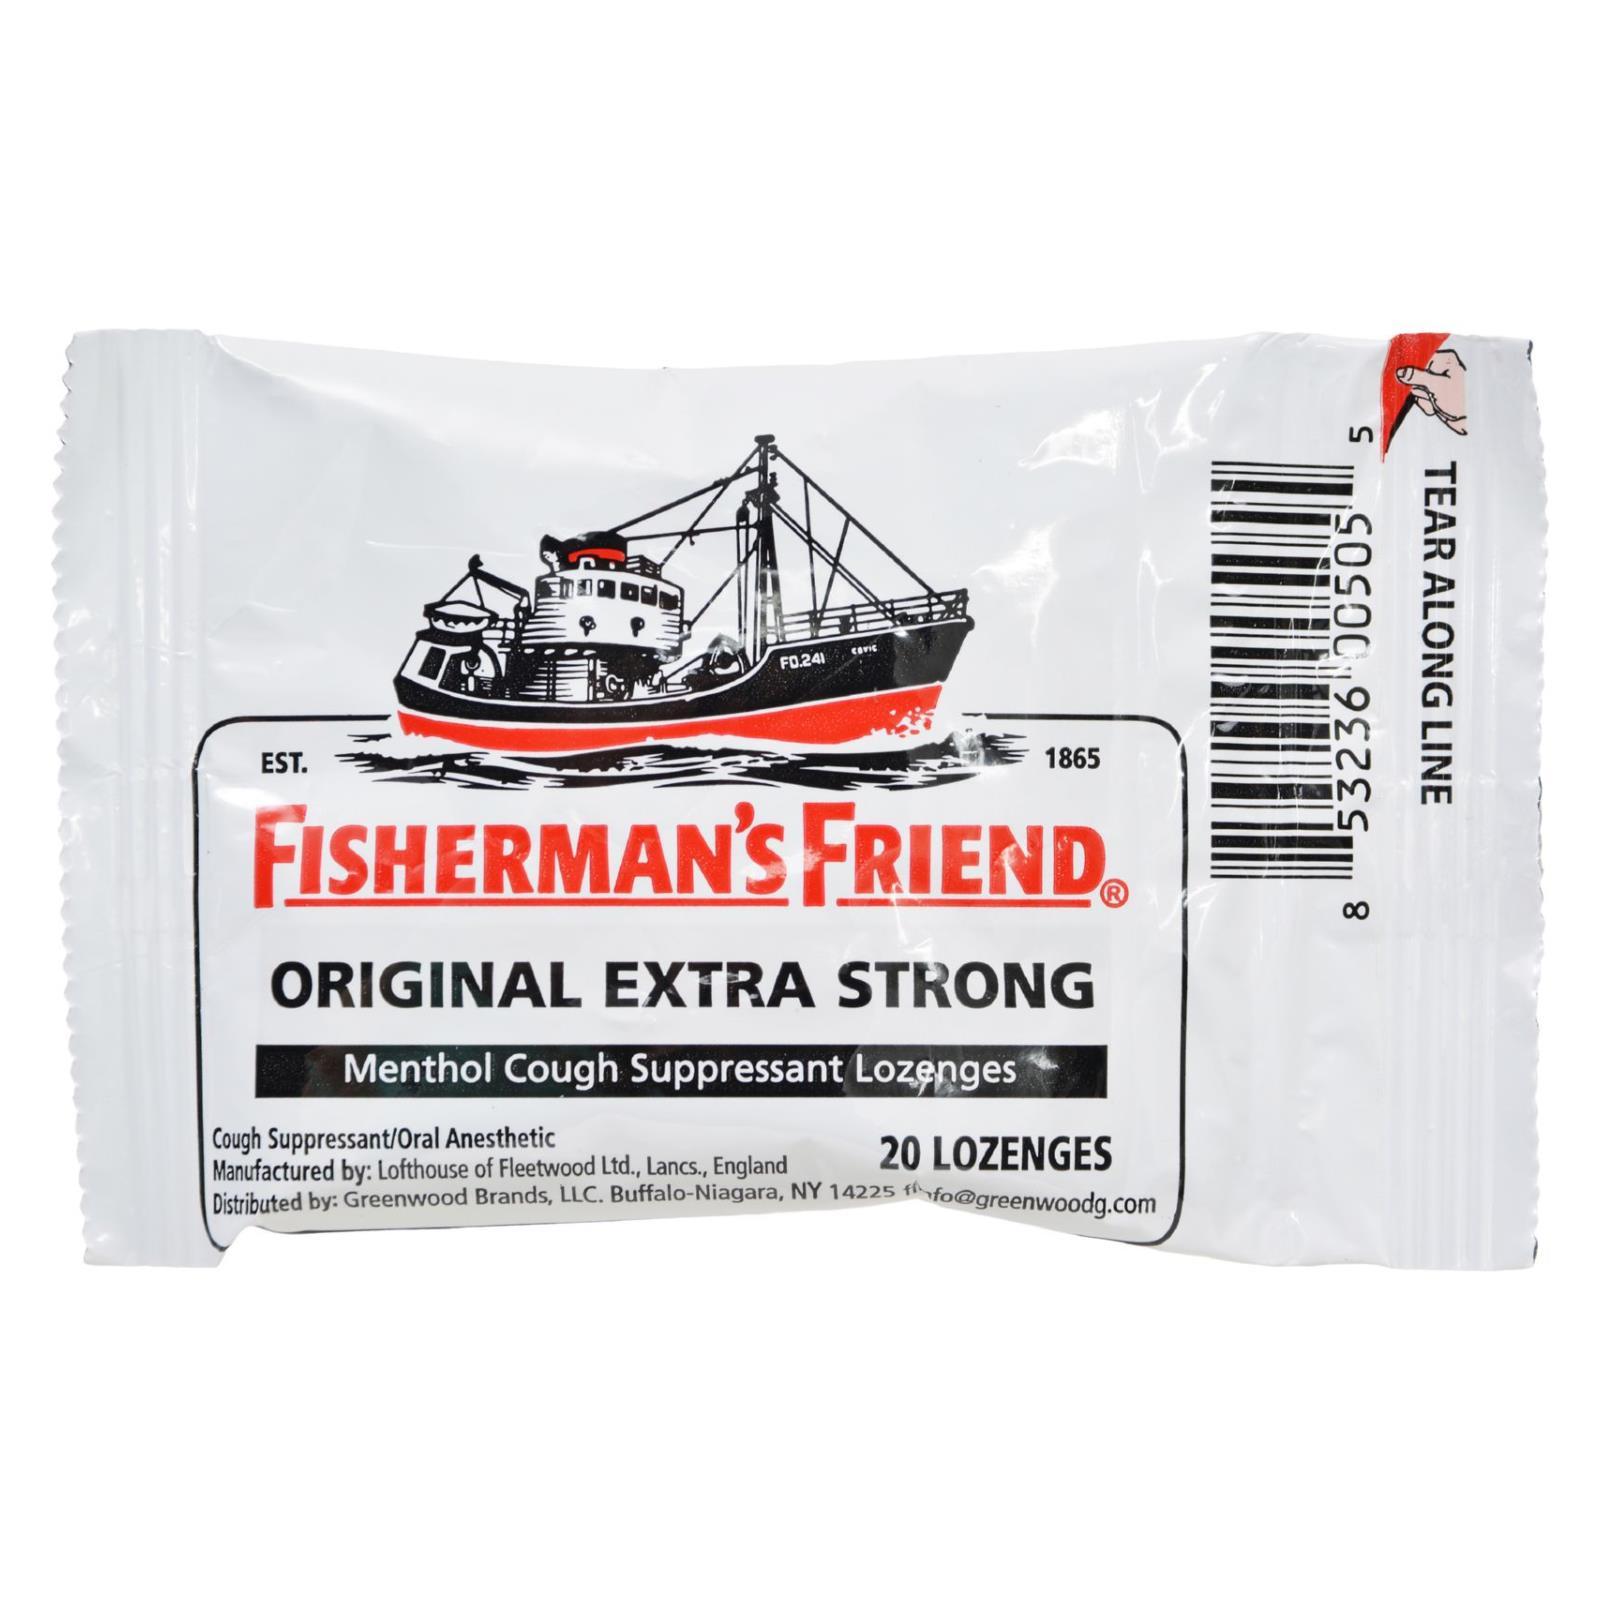 Fisherman's Friend Lozenges - Original Extra Strong - Dsp - 20 ct - 1 Case %count(alt)